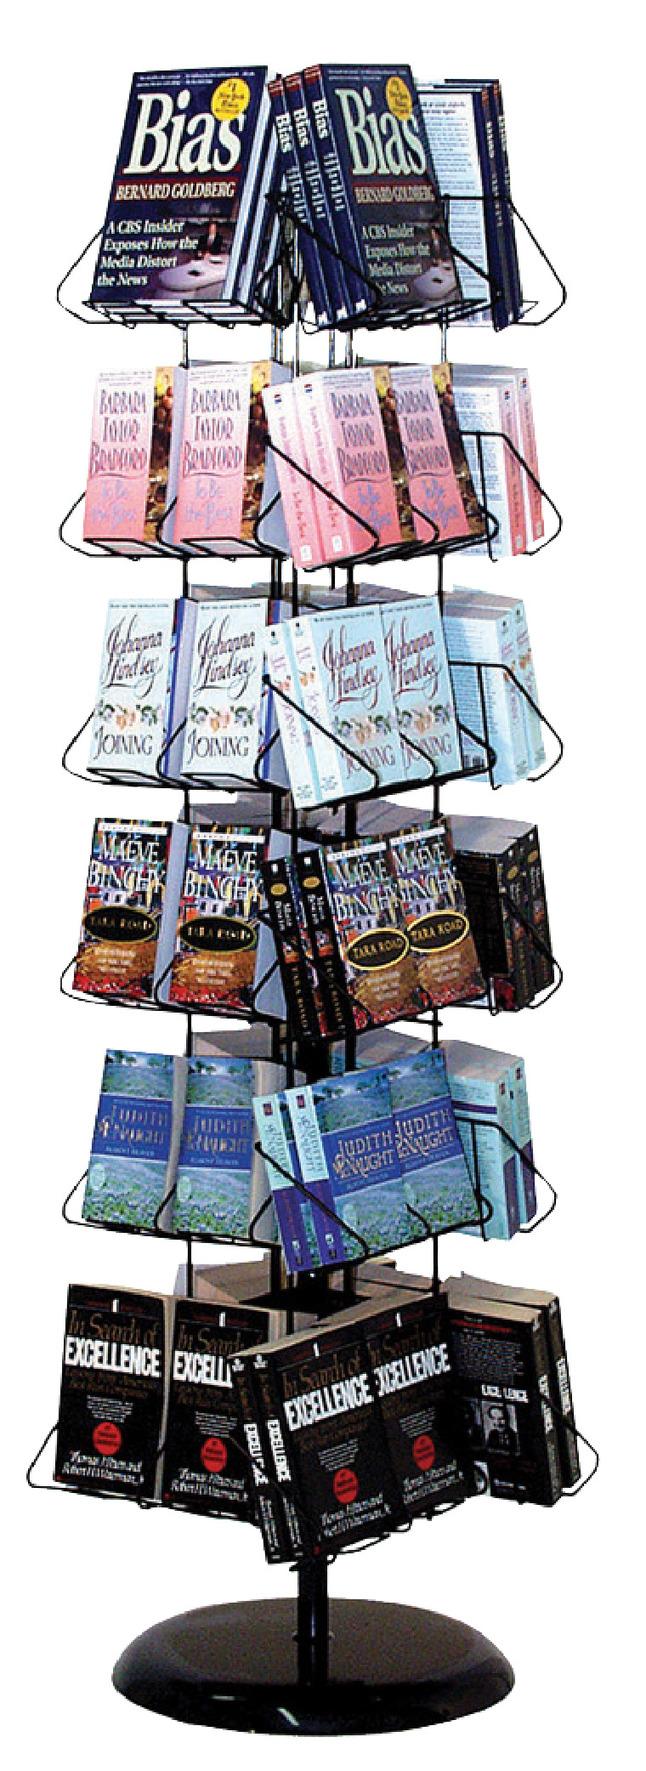 Library Literature Racks Supplies, Item Number 662044